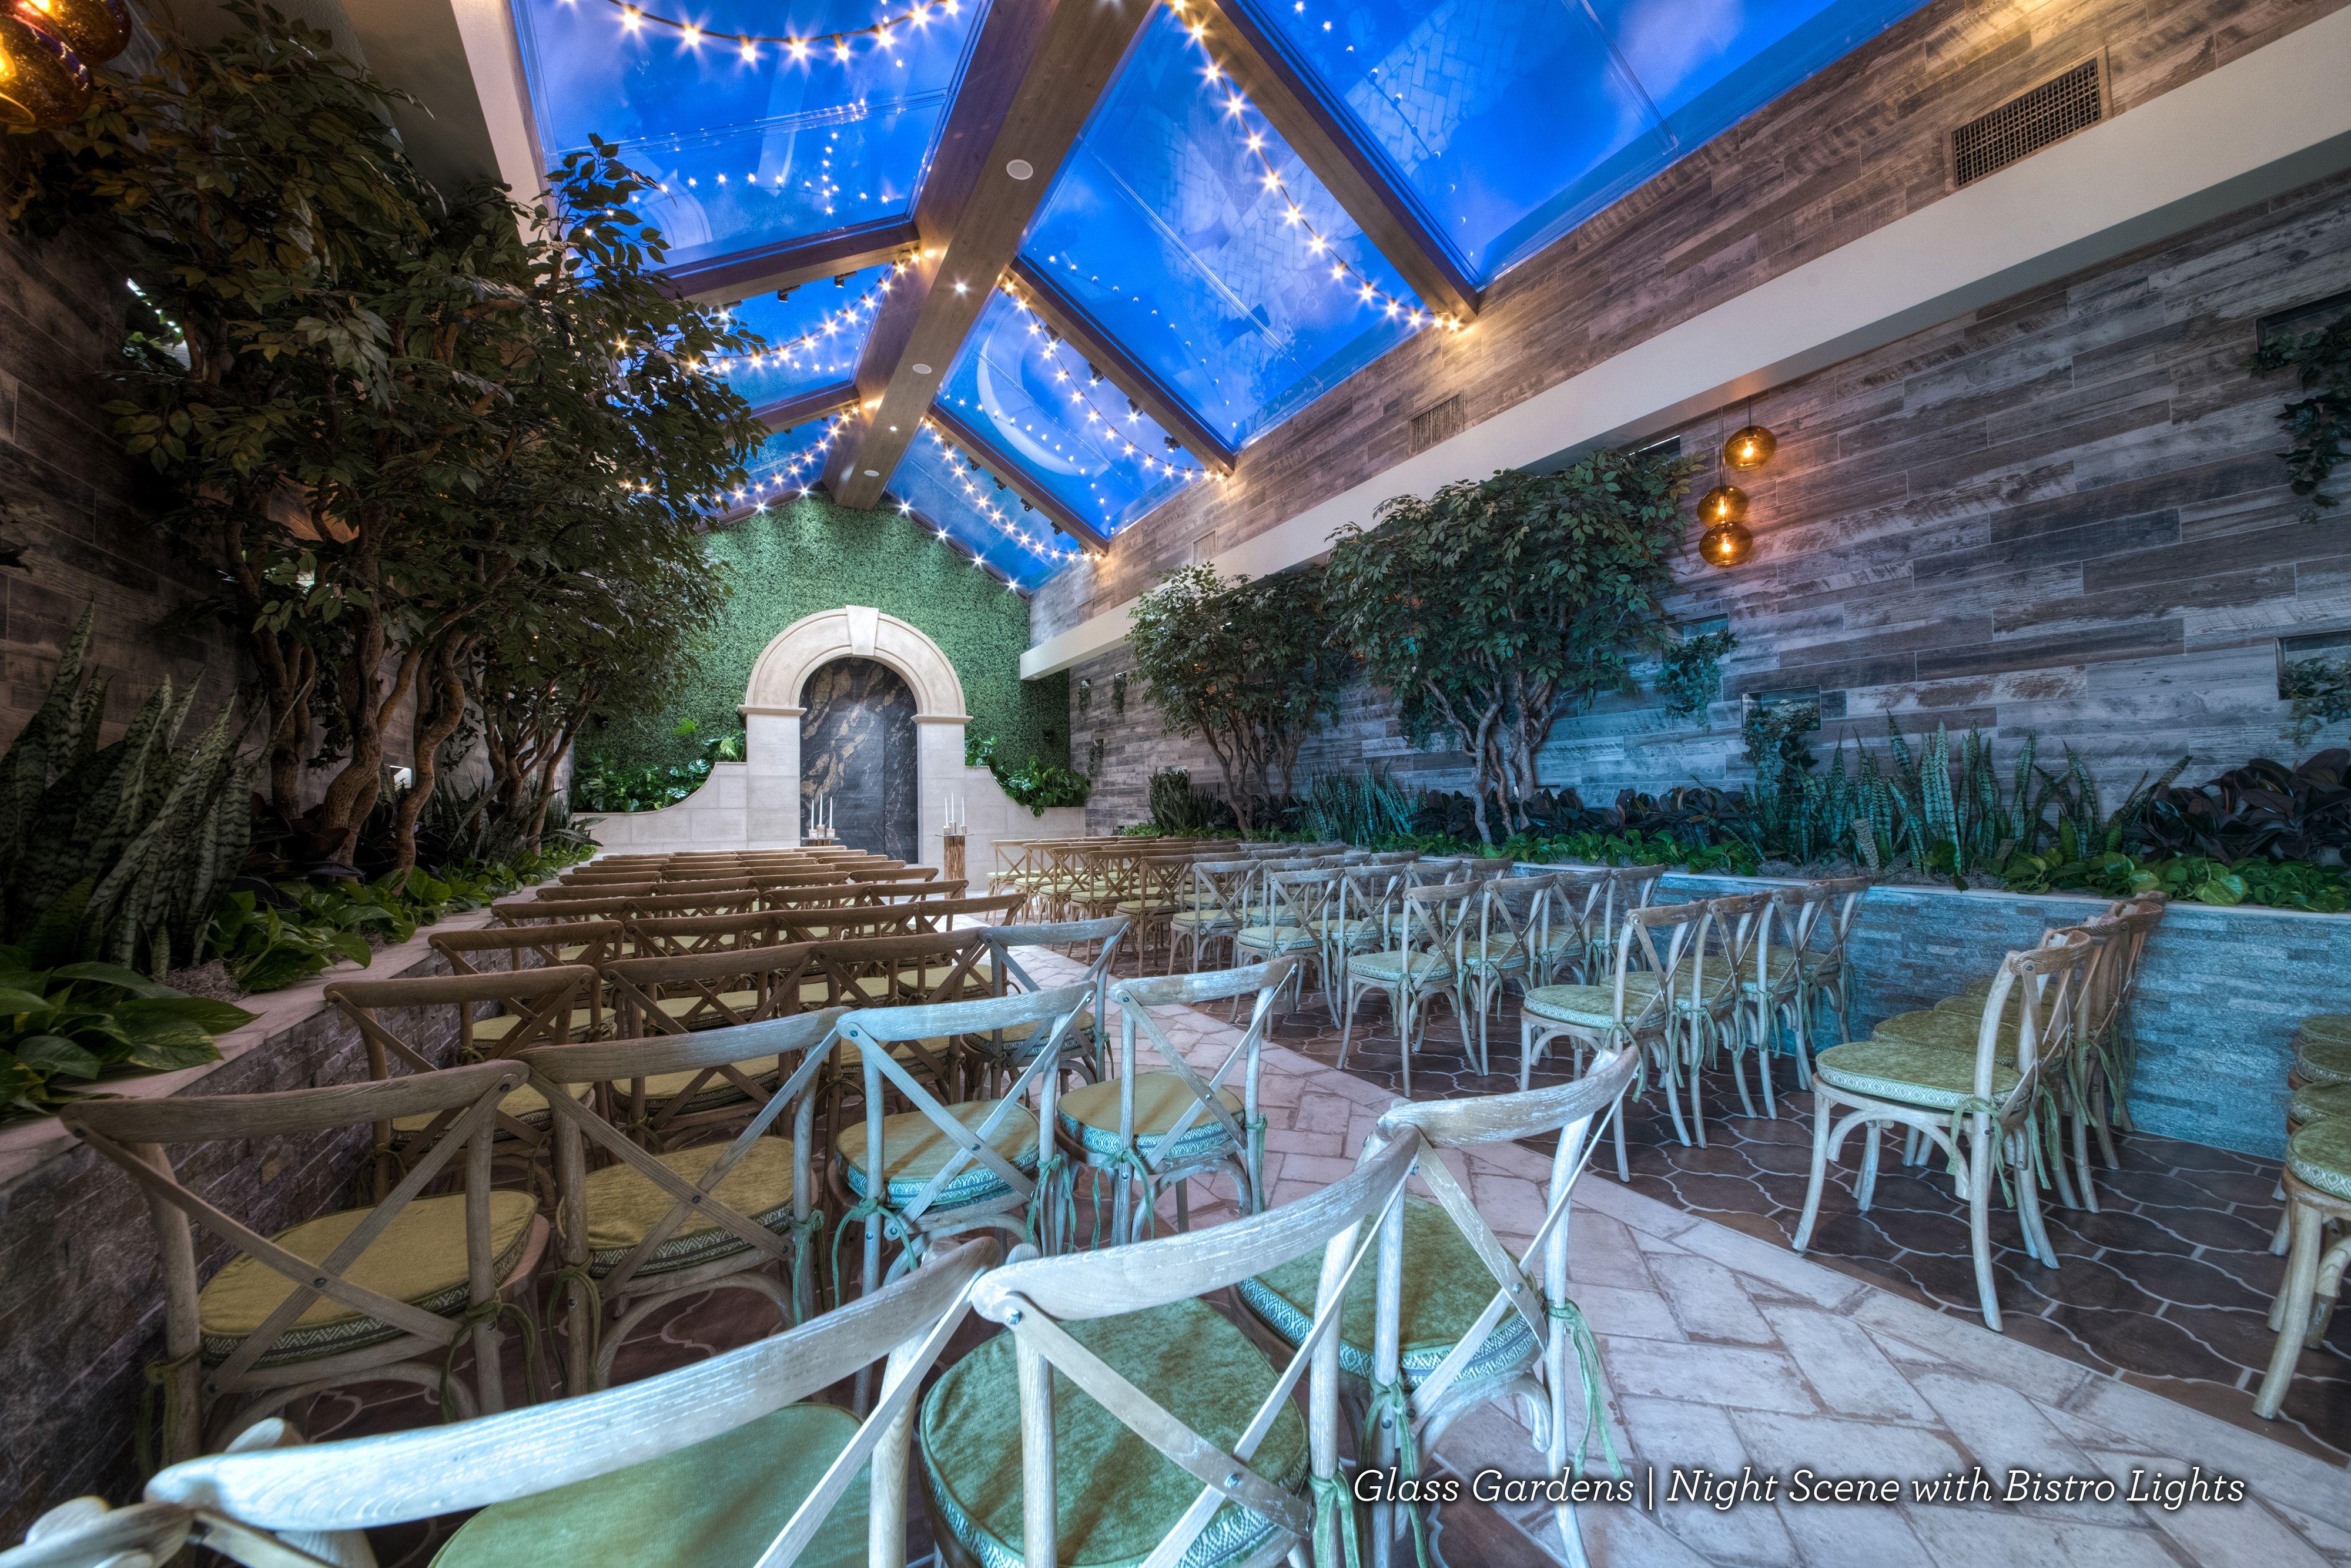 Rustic Chic Weddings Inspired By Barn Weddings Las Vegas Best Wedding Venue Is Chapel Of T Outdoor Wedding Venues Vegas Wedding Chapel Vegas Wedding Reception